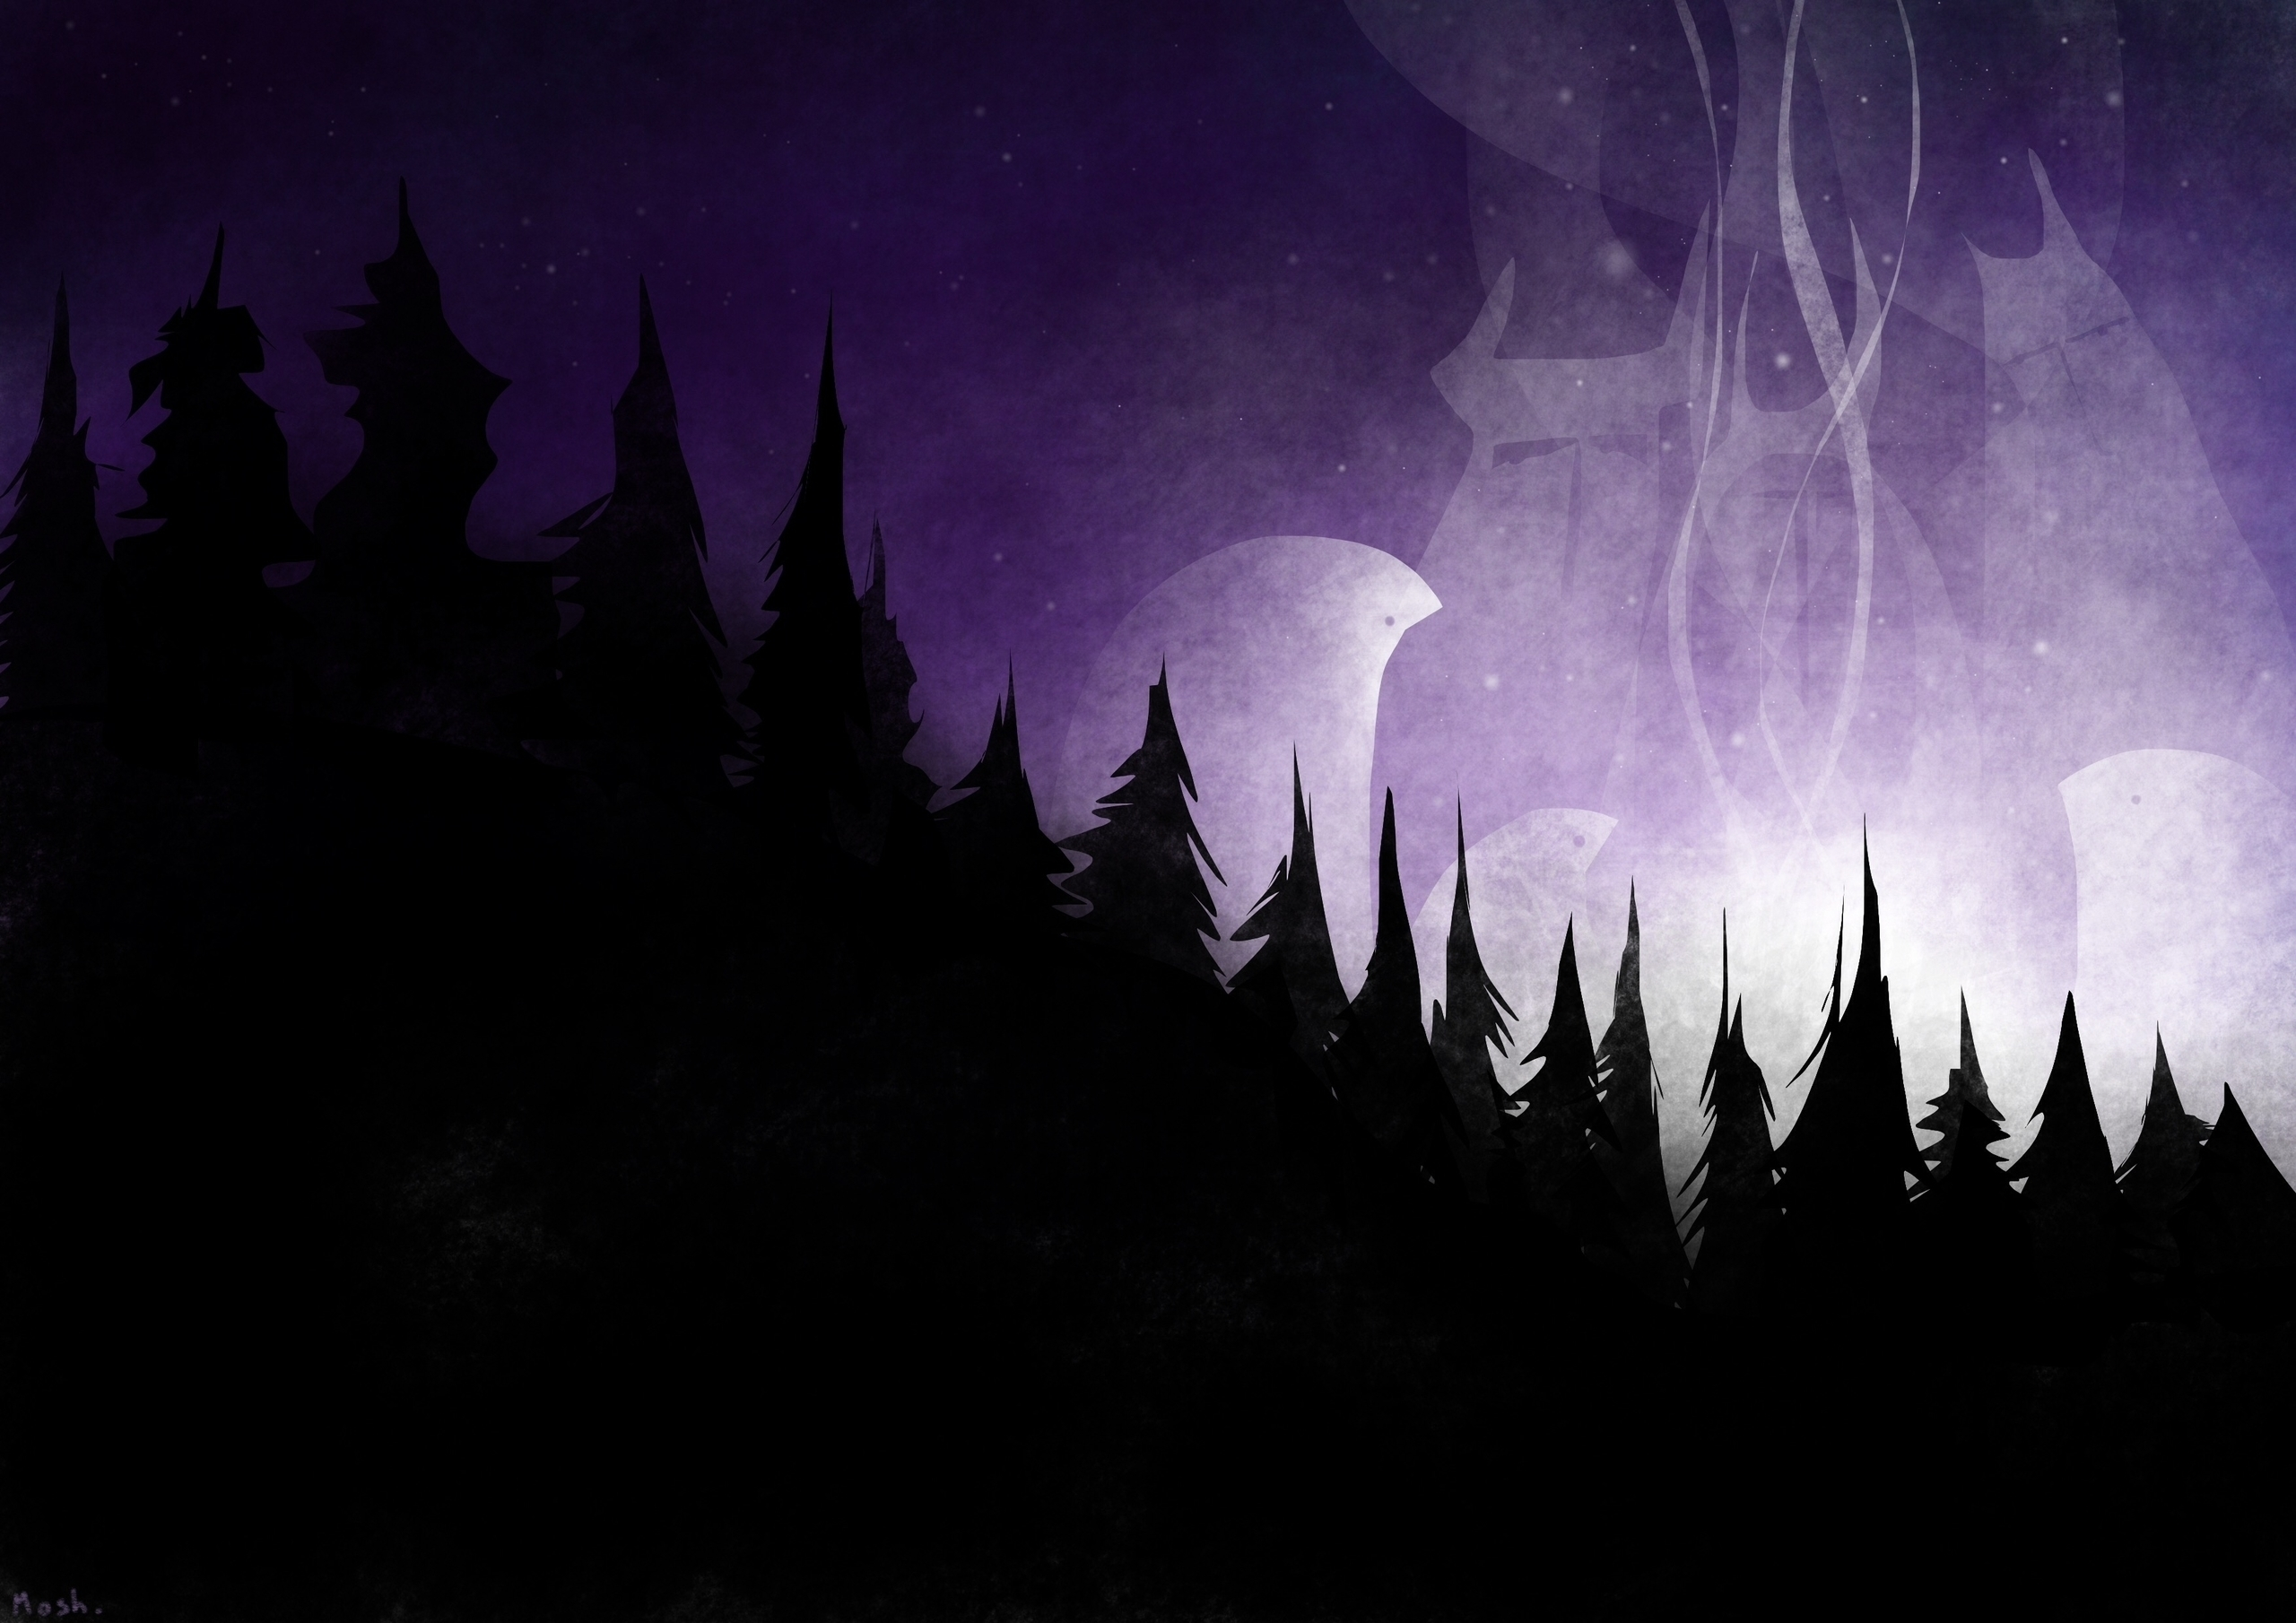 Witching Hour - illustration, characterdesign - mashaghajanyan | ello